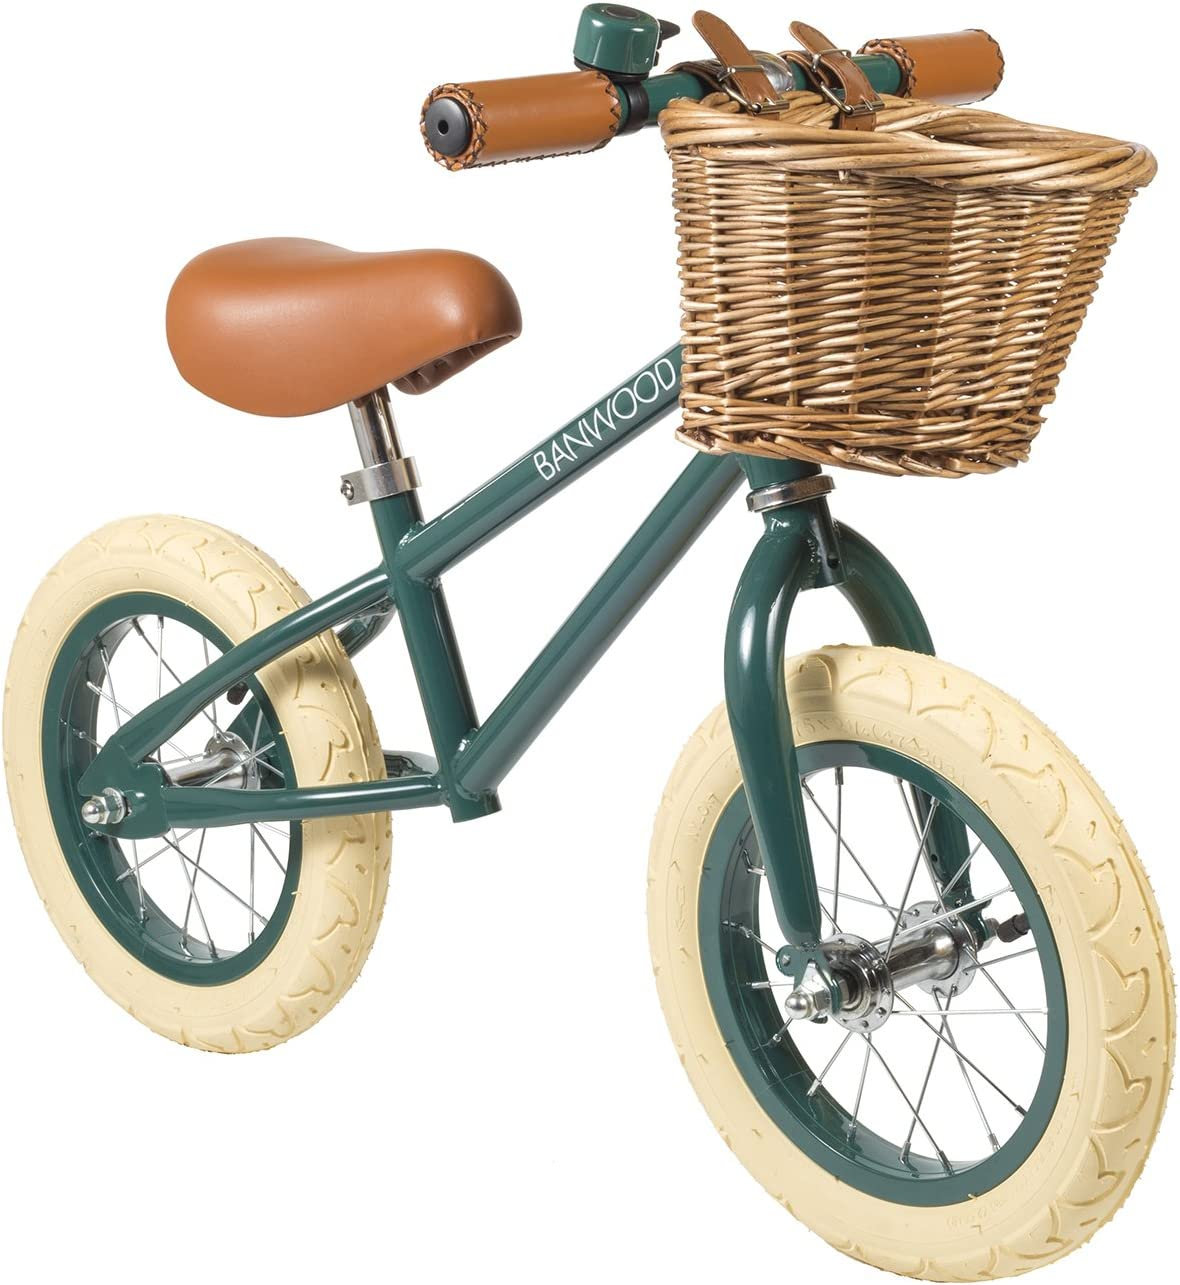 Bicicleta sin pedales, bici de equilibrio, balance bike Banwood color verde